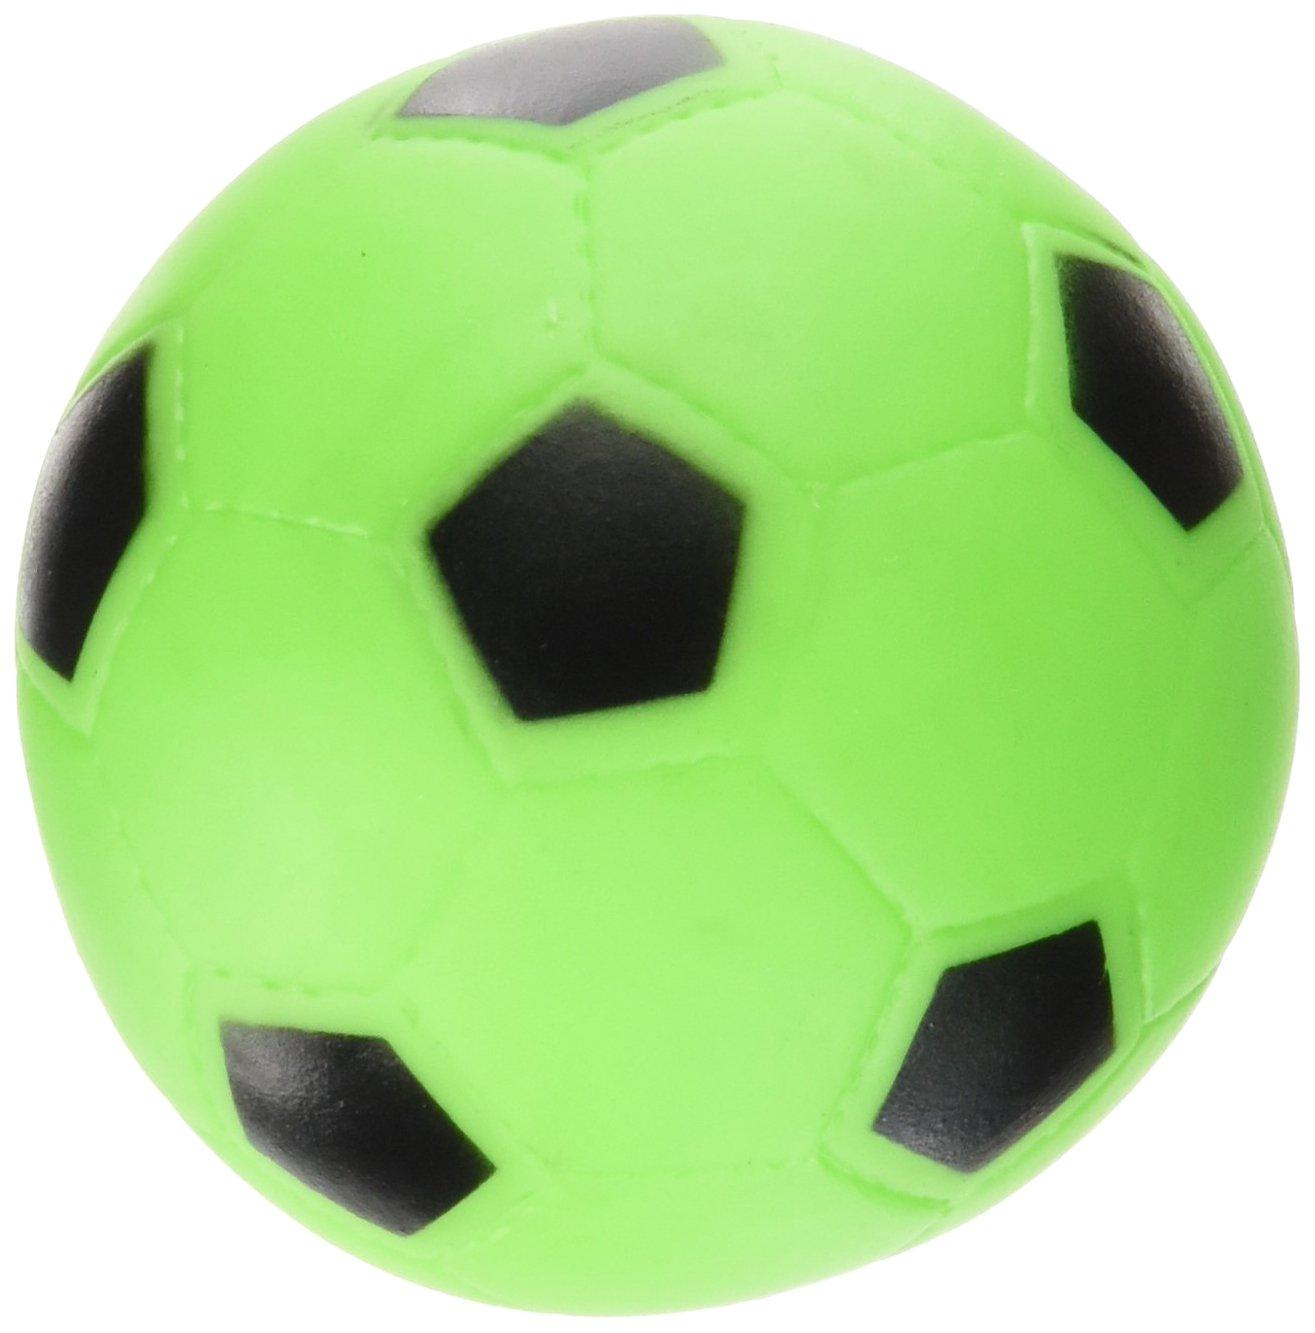 Ethical Vinyl Soccer Ball Dog Toy, 3-Inch 3097